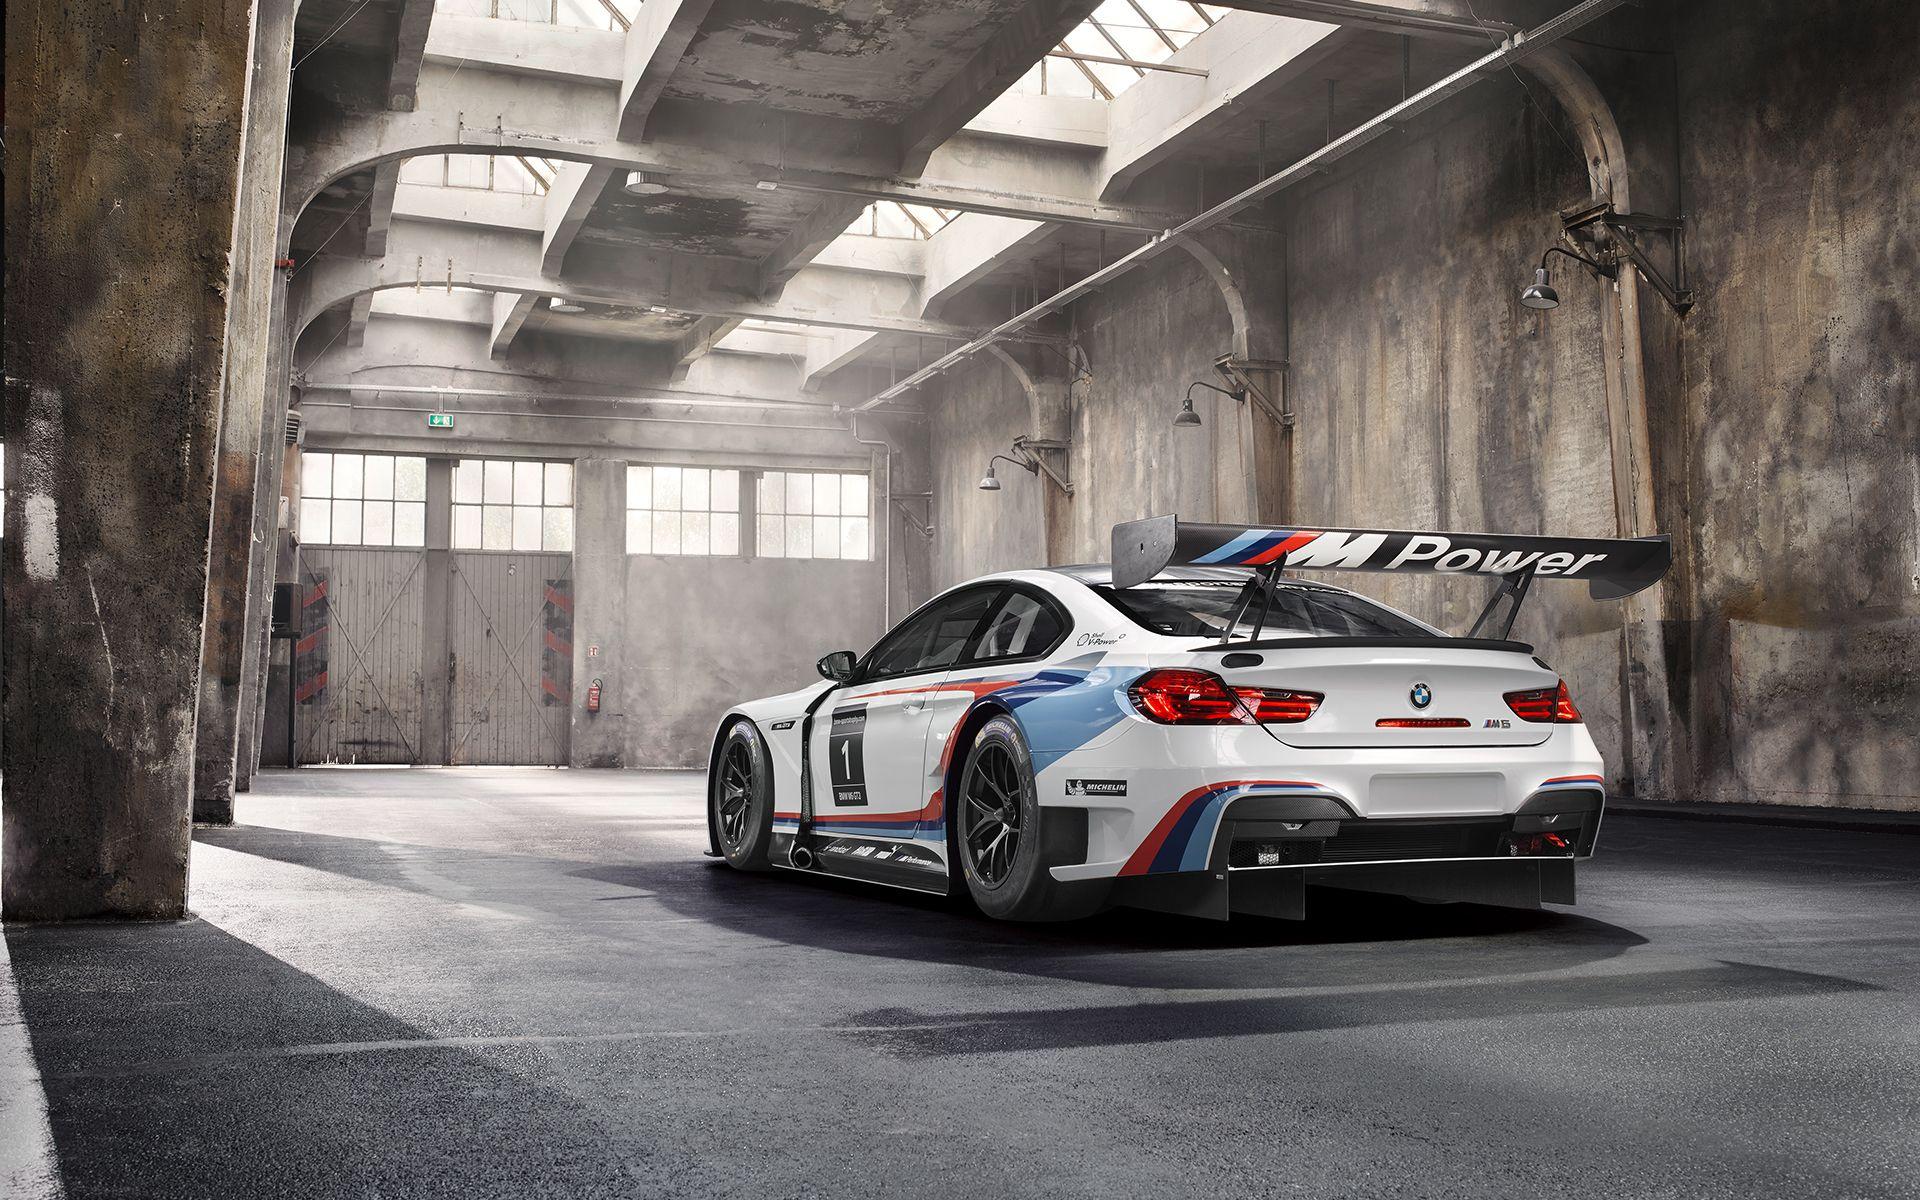 Wallpapers BMW M6 GT3. http://www.bmw-motorsport.com/en ...